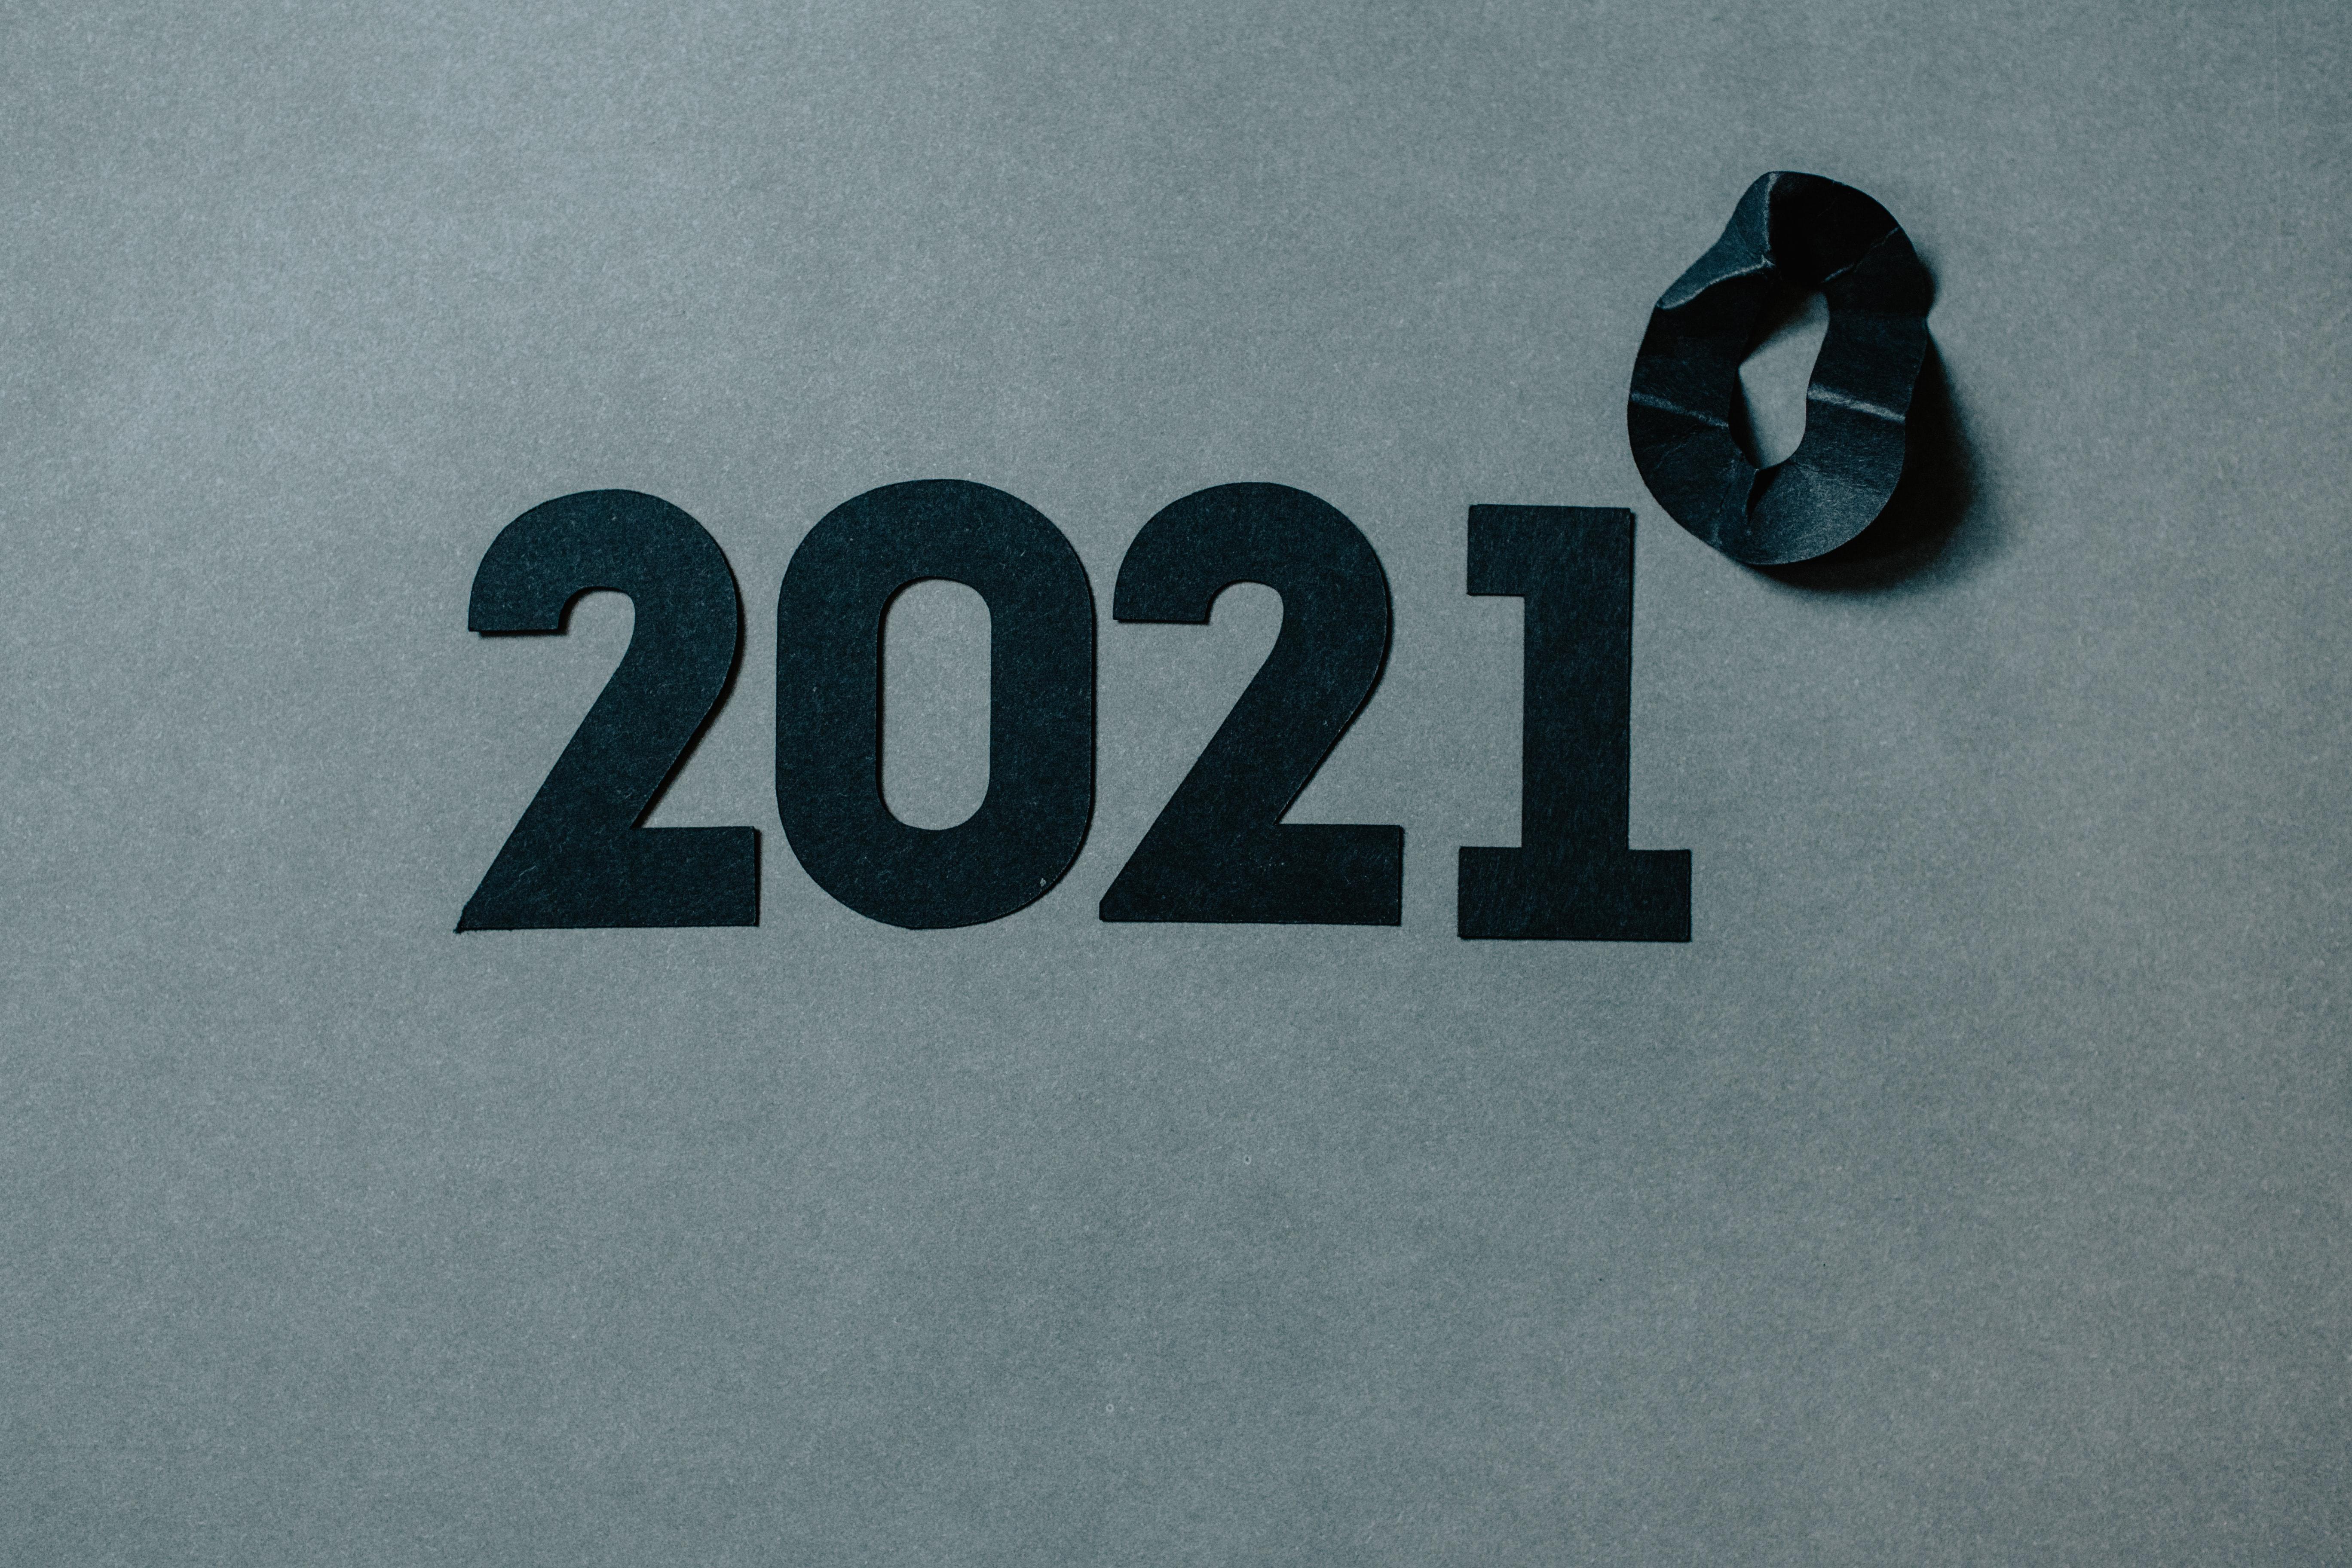 тренды дизайна 2021 баннер